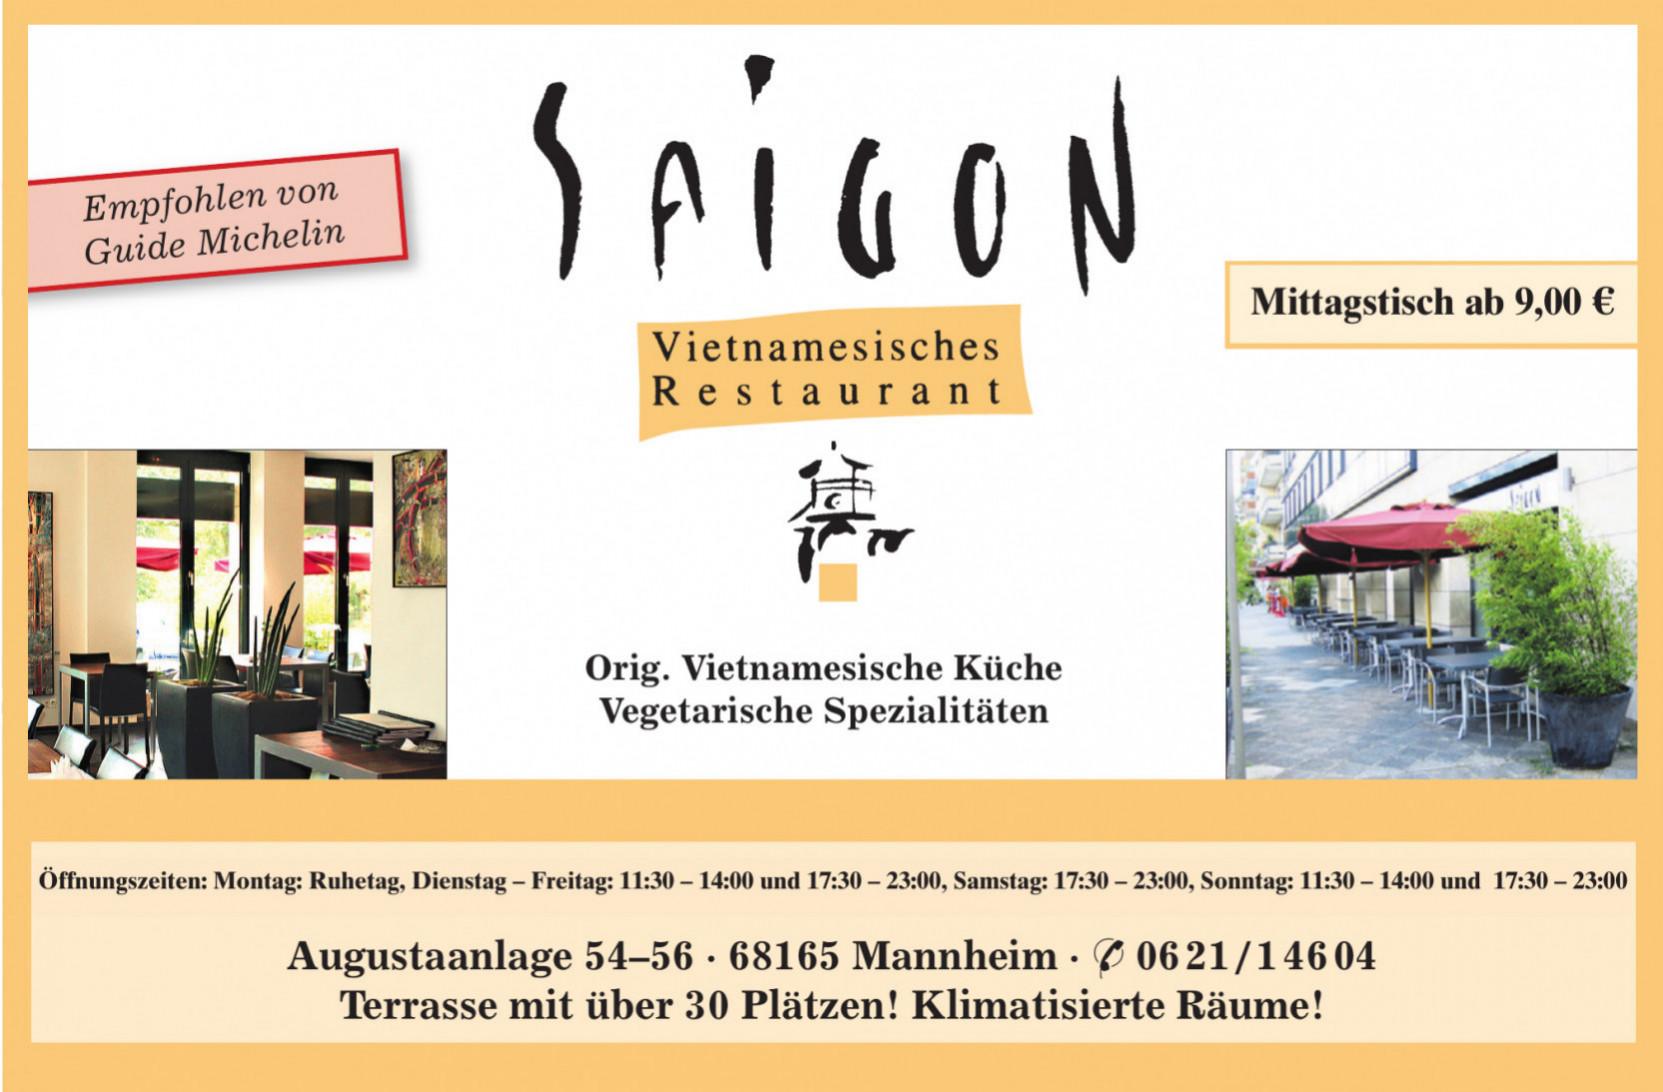 Saigon Vietnamesisches Restaurant